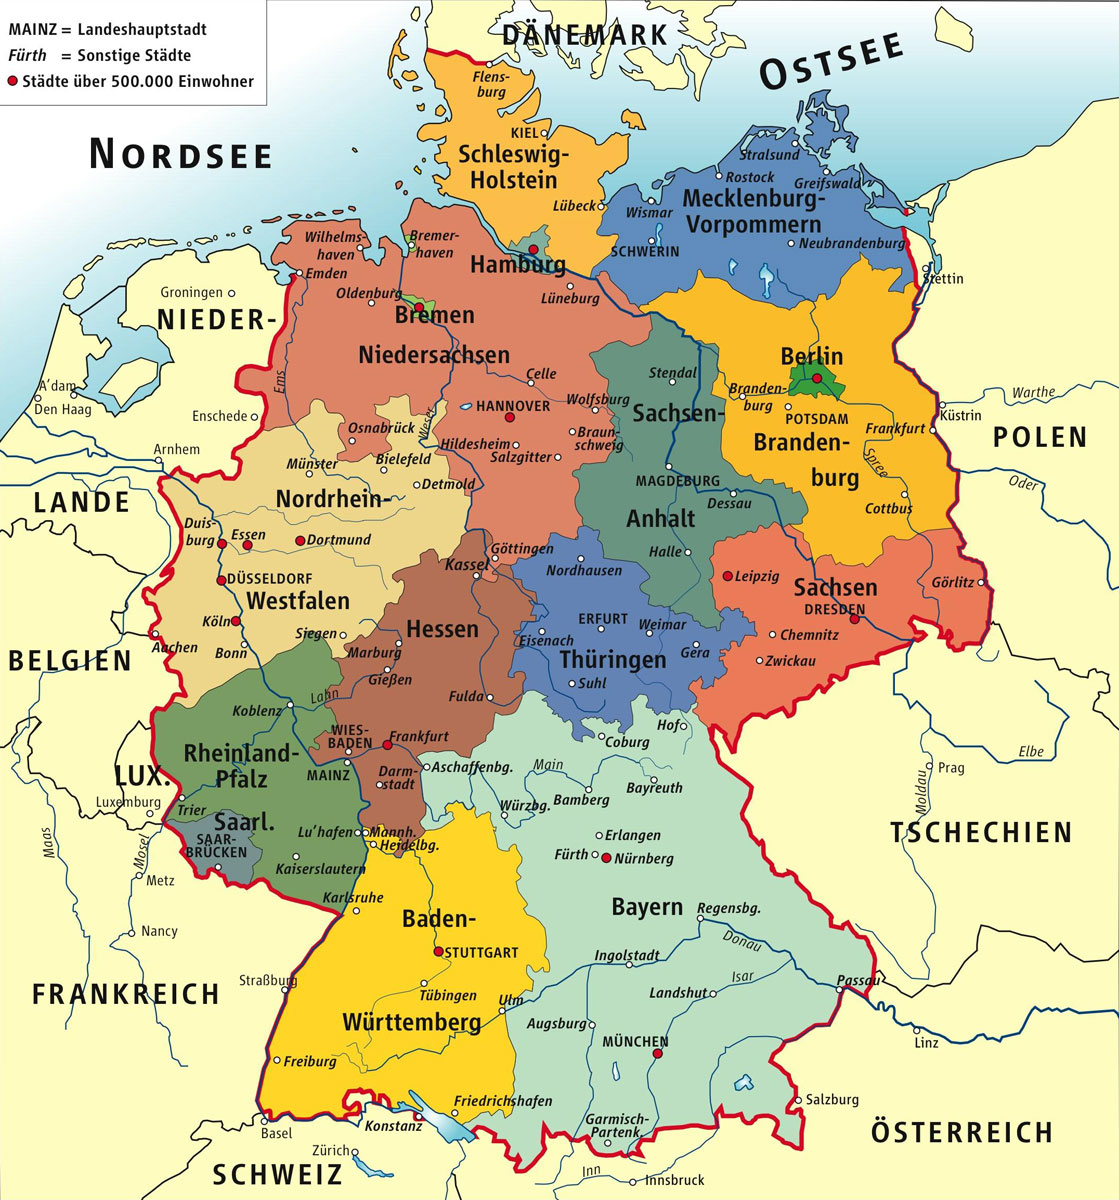 Carte Allemagne Lander.J Aime L Allemand Civilisation Et Geographie De L Allemagne